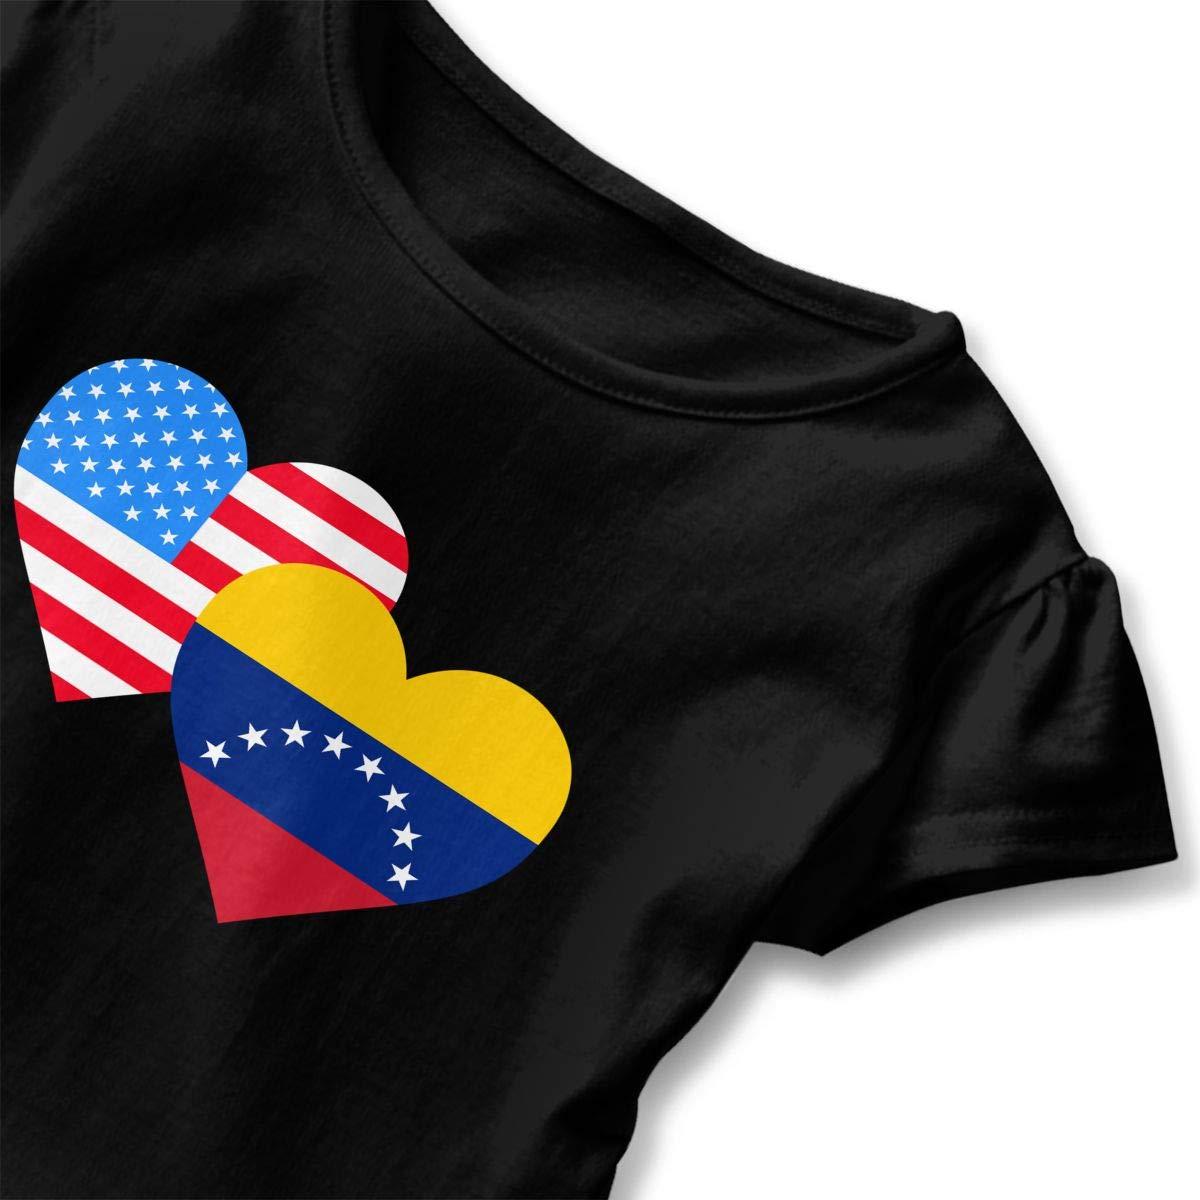 SHIRT1-KIDS American Venezuela Hraet Flag-1 Toddler//Infant Girls Short Sleeve T-Shirts Ruffles Shirt Tee Jersey for 2-6T